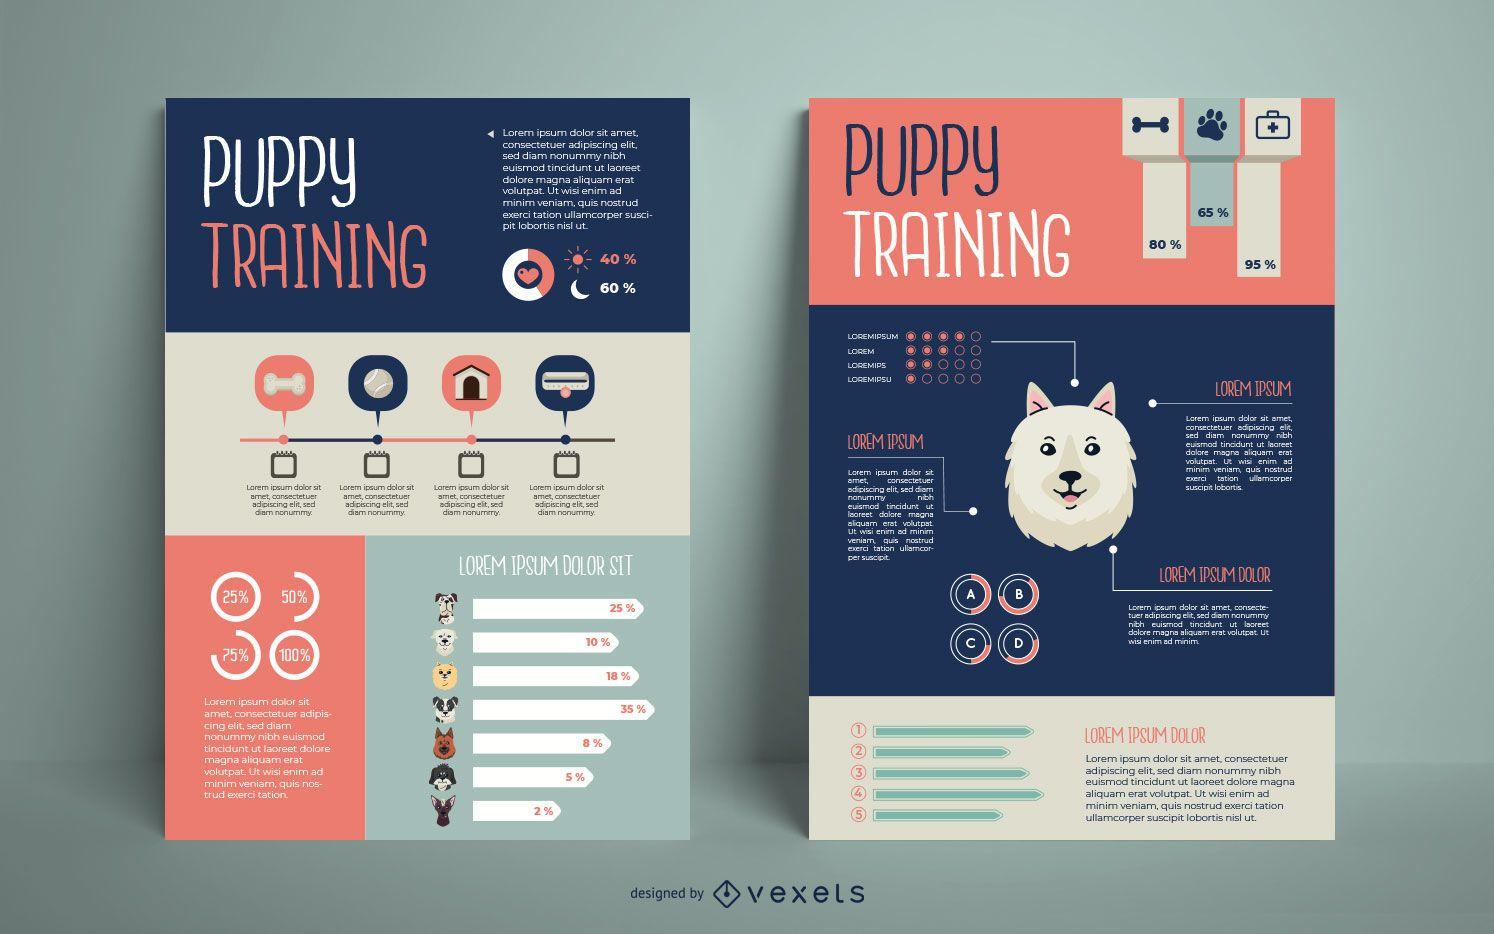 Dog Training Infographic Design